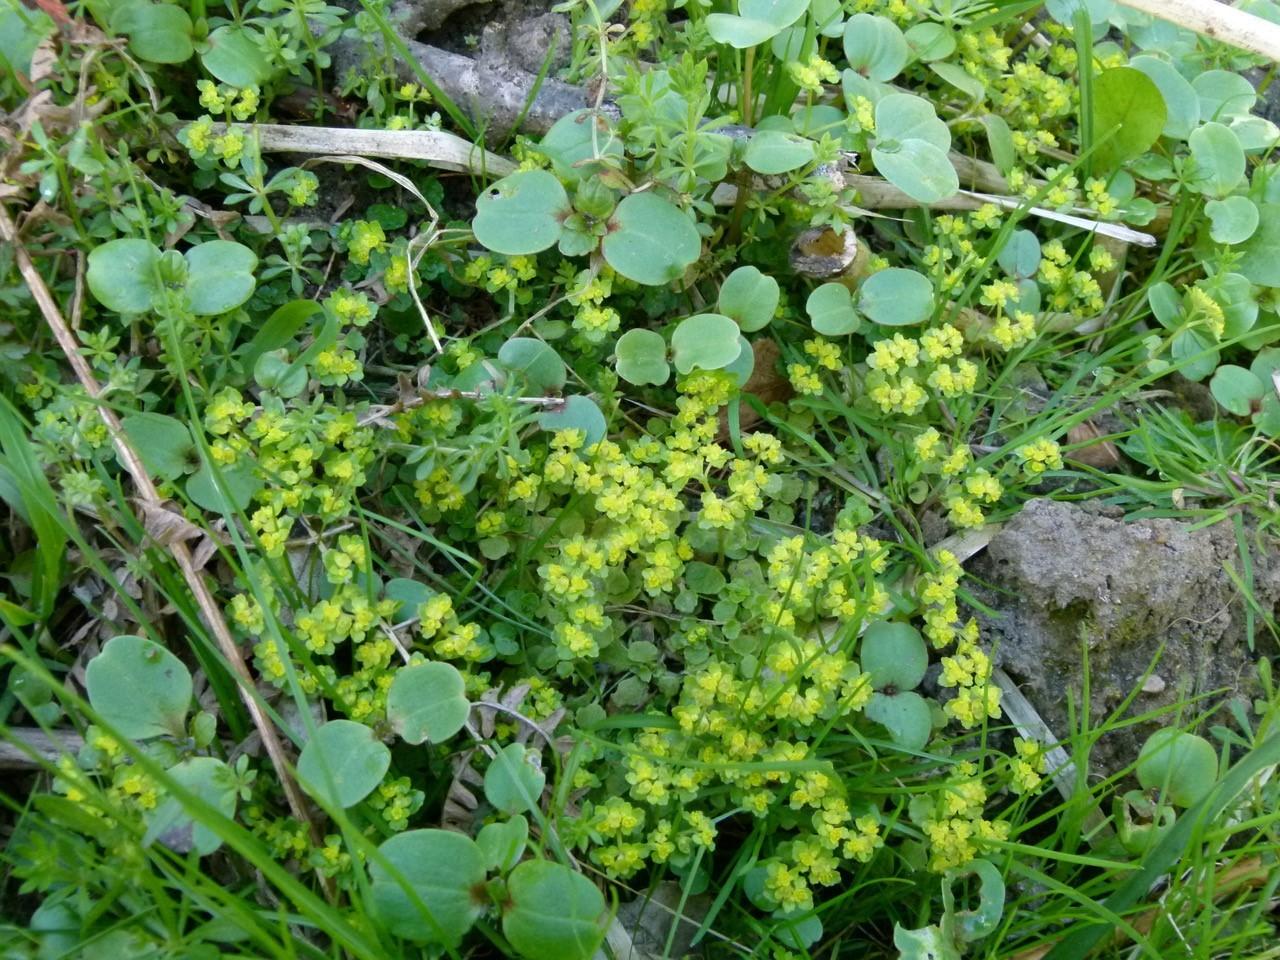 Opposite-leaved Golden Saxifrage (Chrysoplenium alternifolium), Hollicars